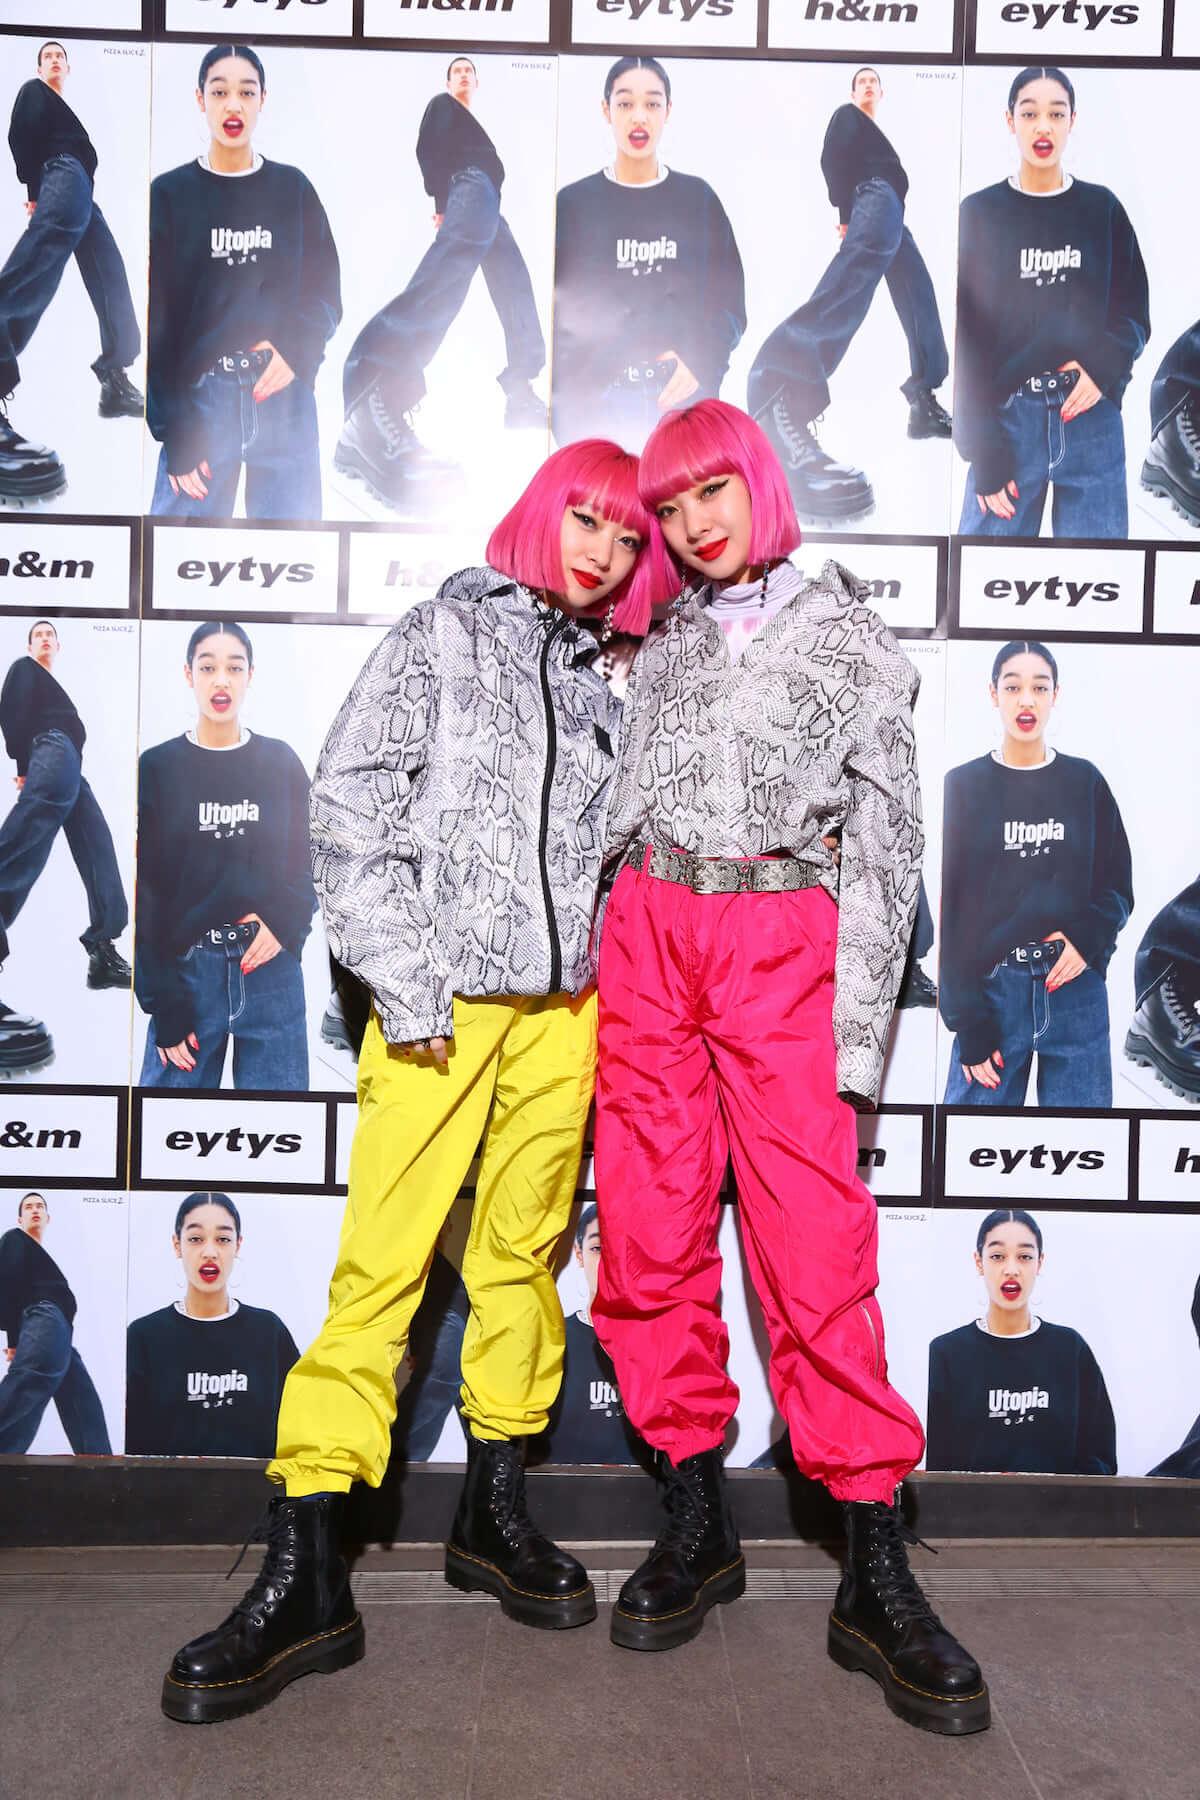 Eytys×H&Mのコラボコレクションが本日より発売開始 life-fashion190124-hm-eytys-3-1200x1800